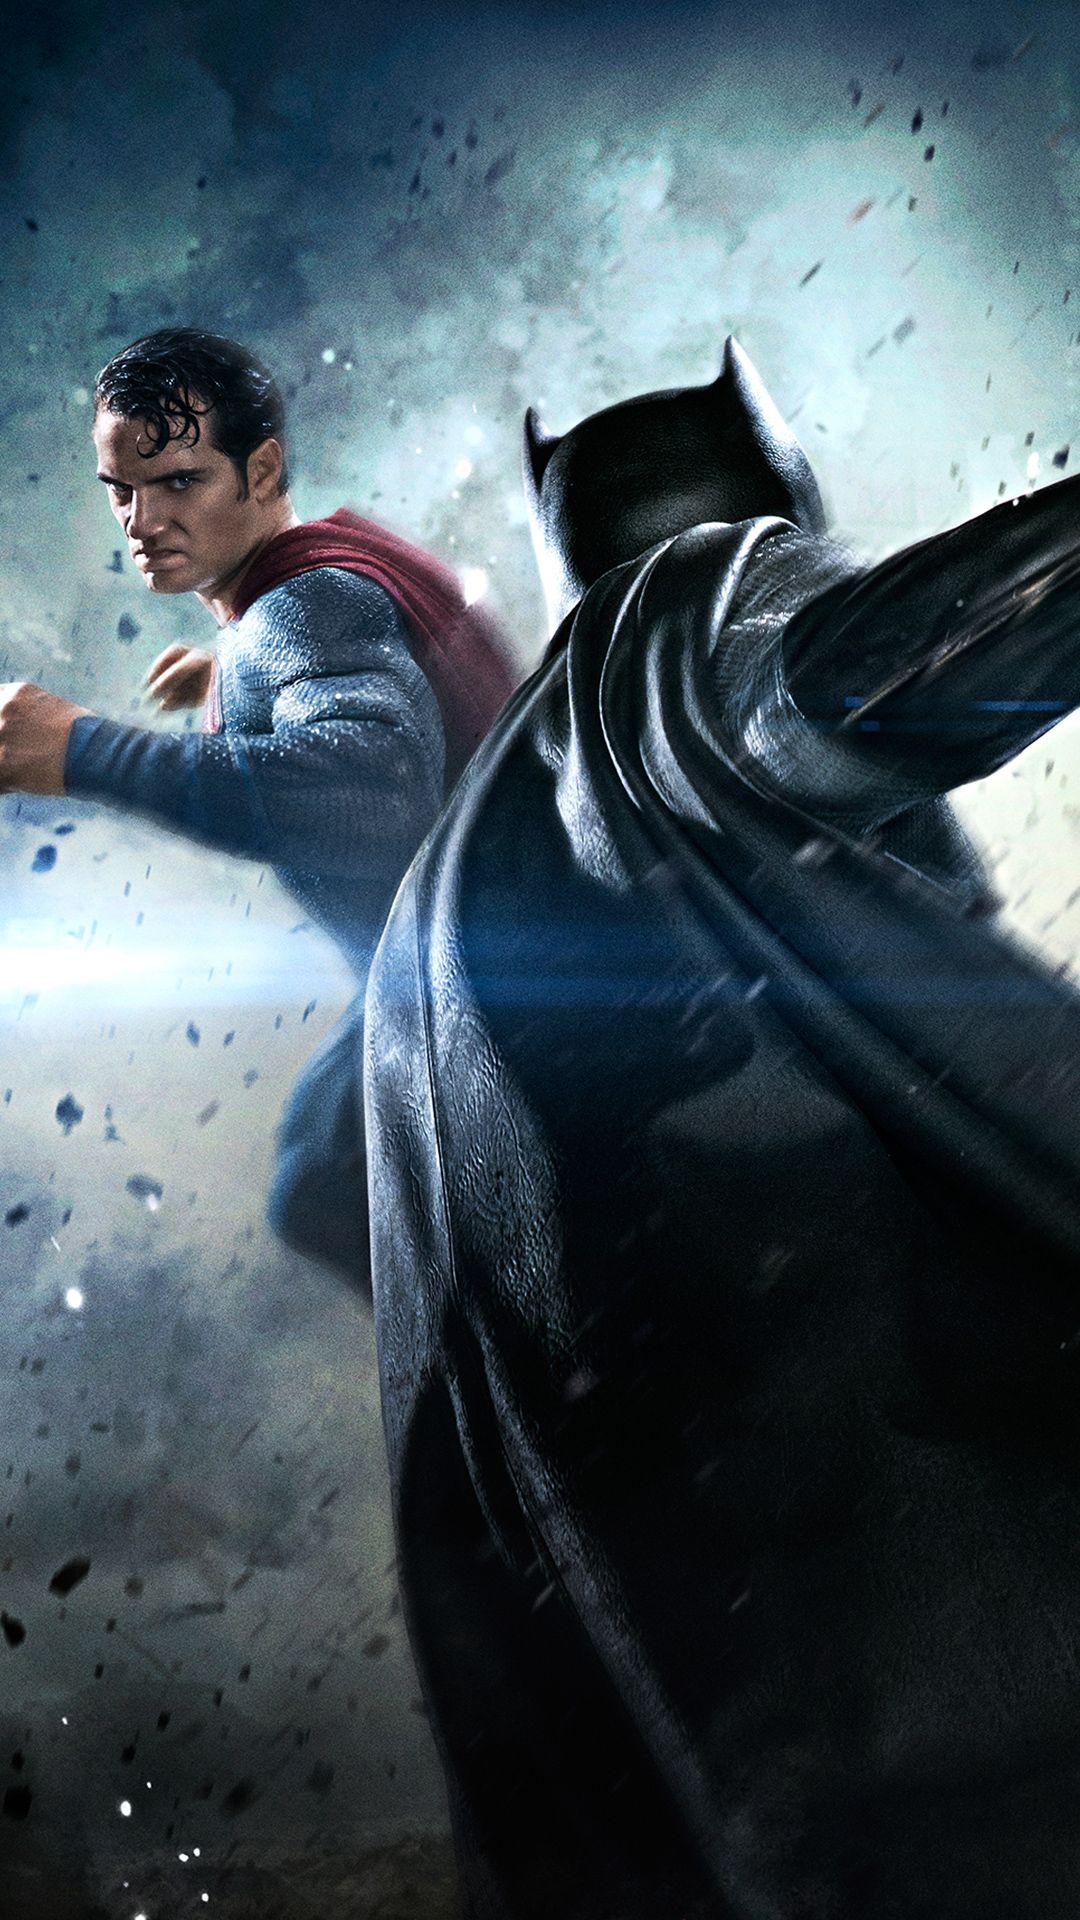 Batman Vs Superman Movie Fight Iphone 6 Plus Hd Wallpaper Batman Vs Superman Movie Superman Movies Batman Vs Ultra hd batman vs superman hd wallpaper